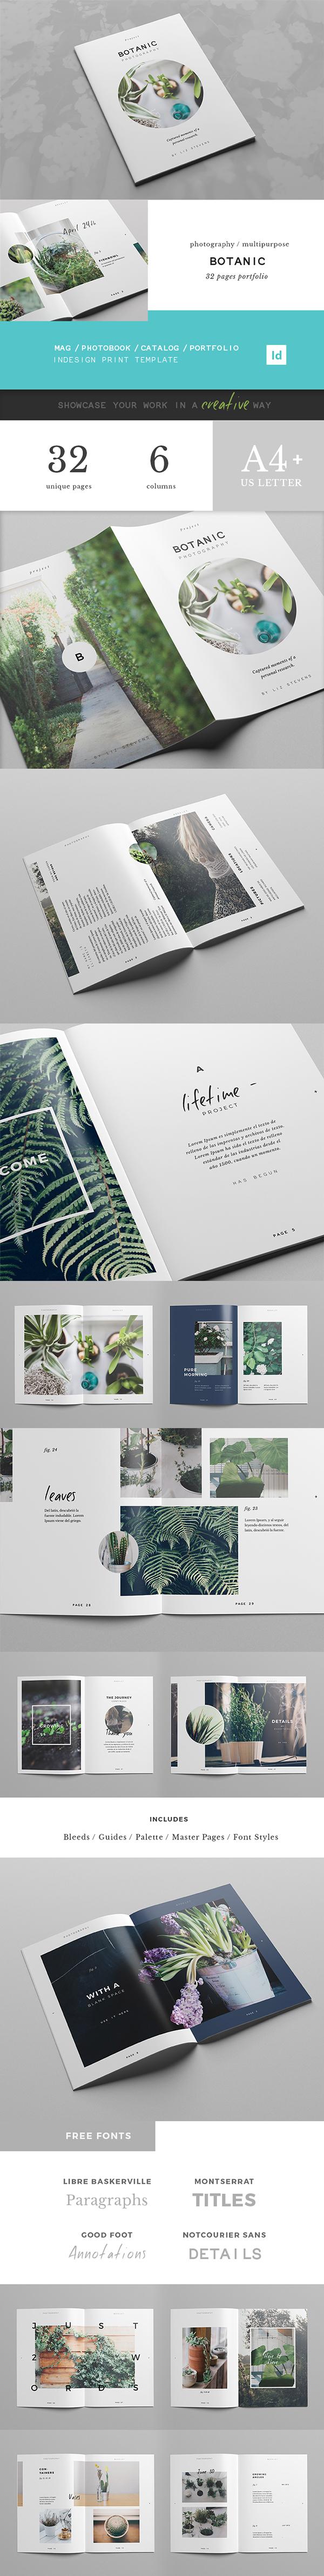 botanic portfolio template on editorial design served book